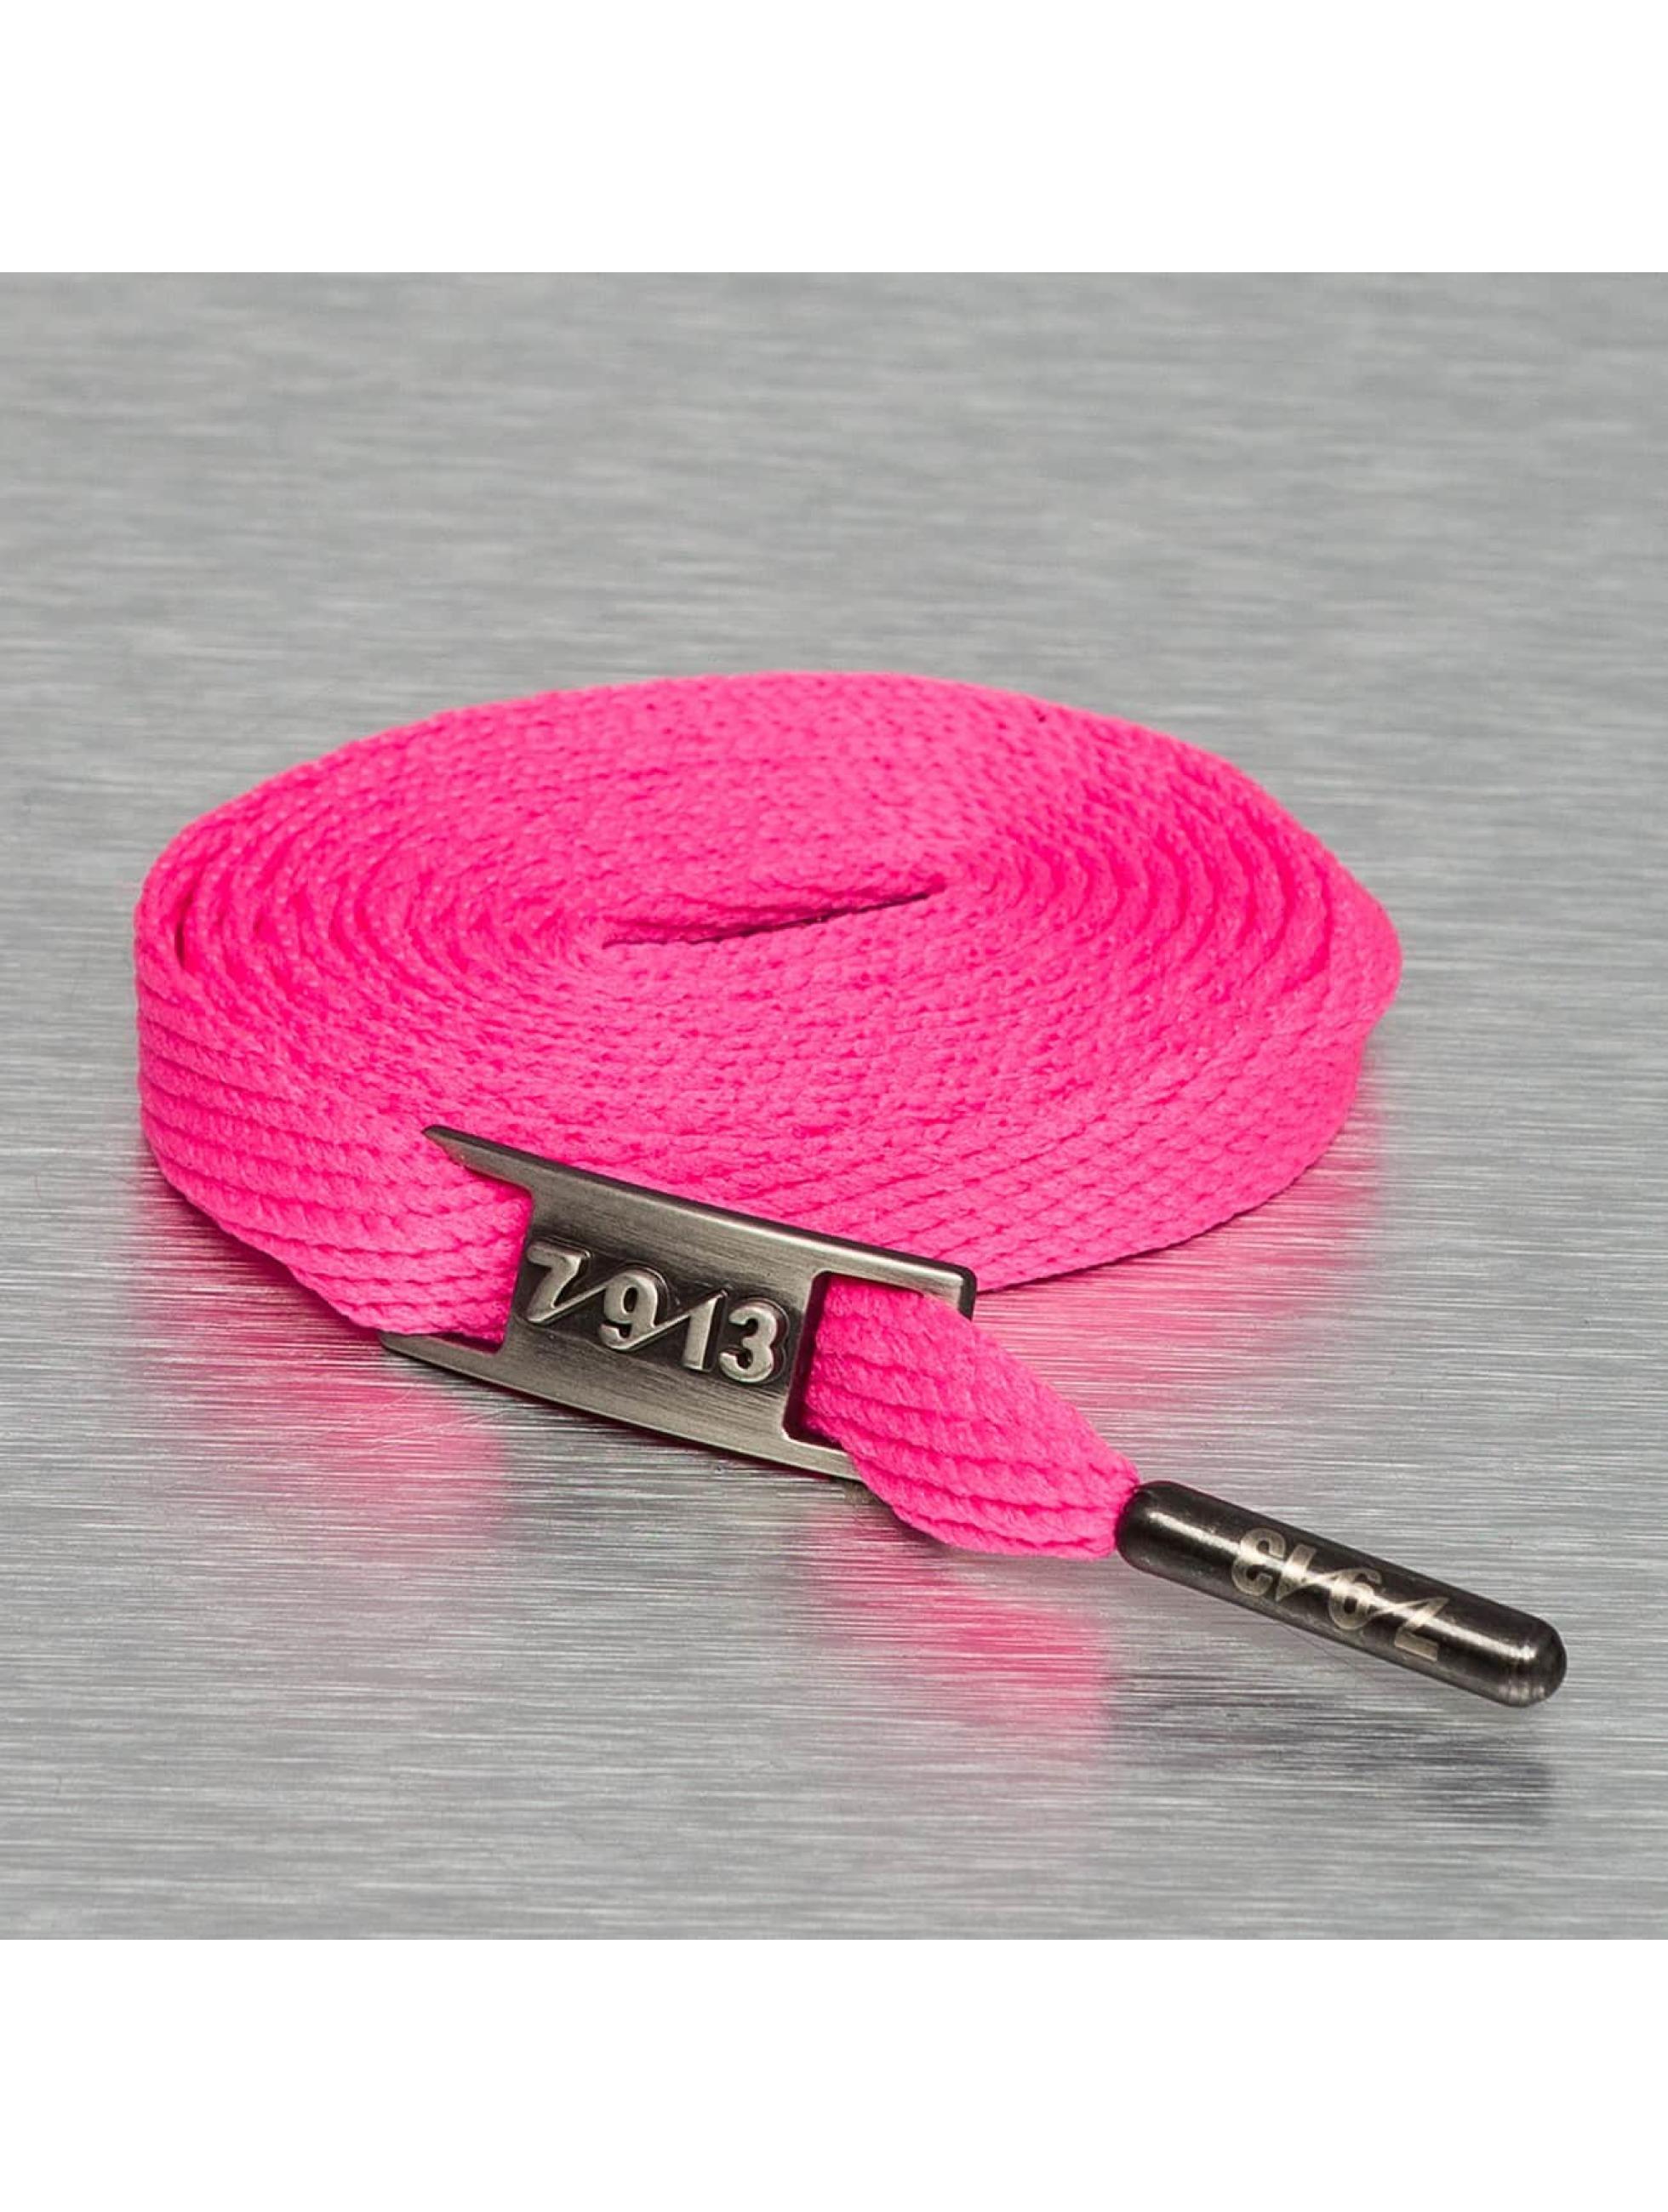 Seven Nine 13 Dodatki do butów Full Metal pink